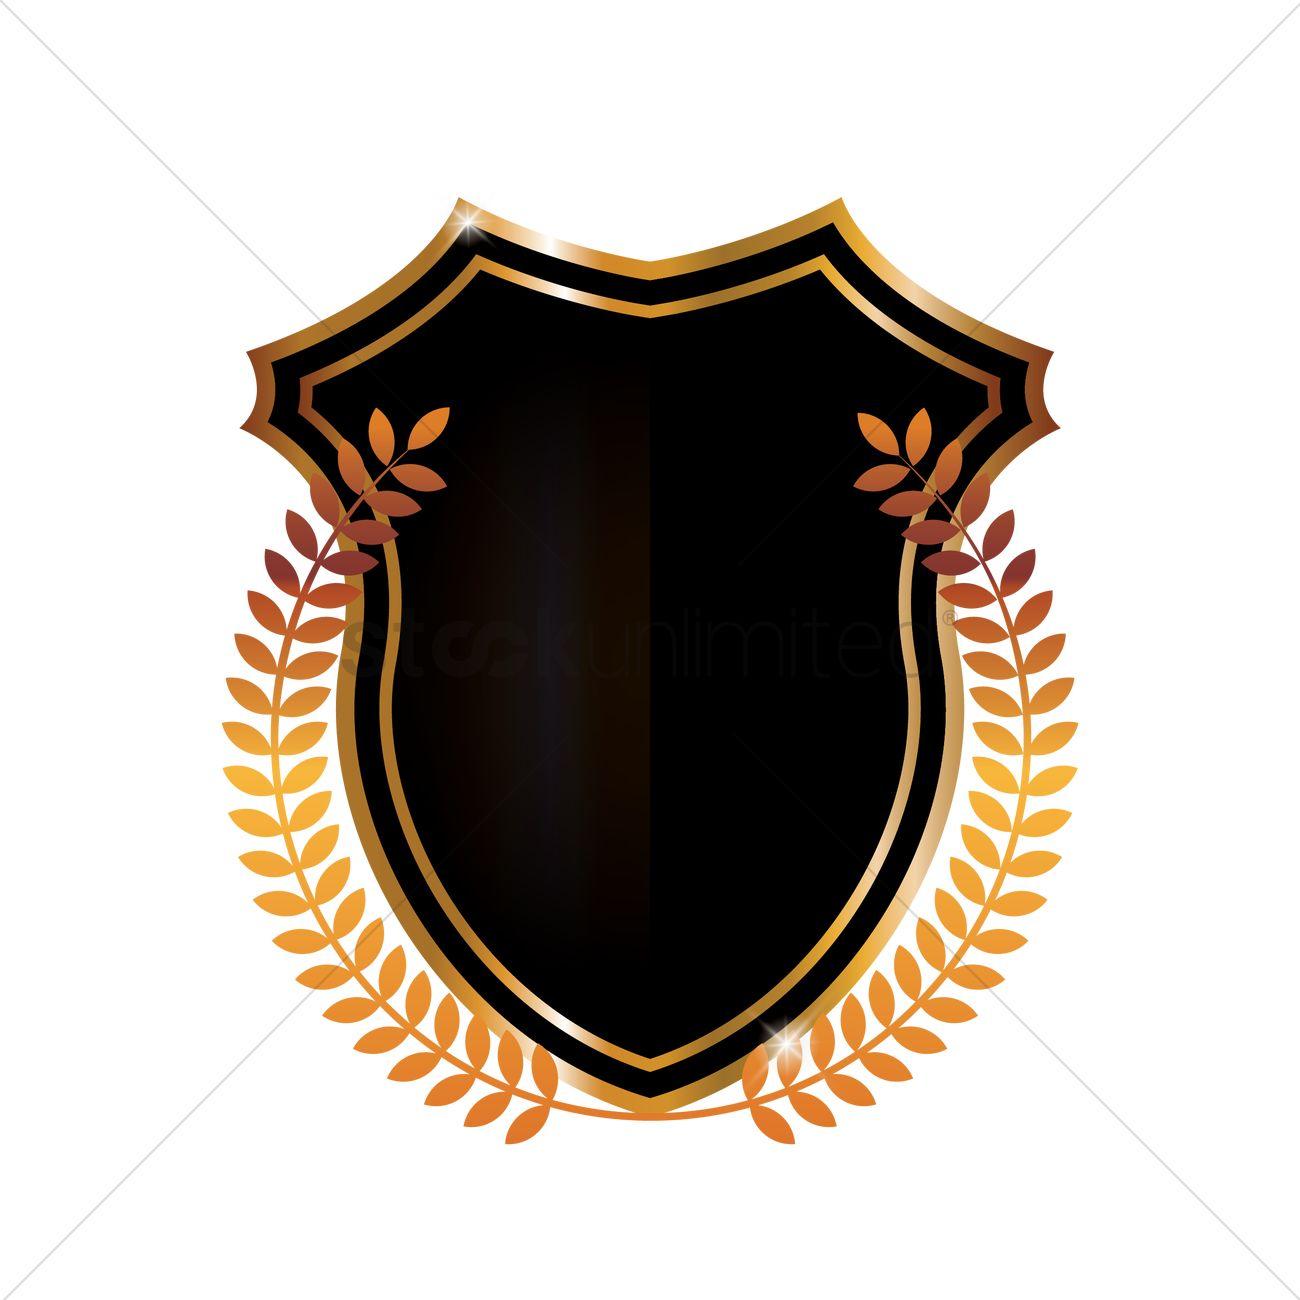 Black shield emblem vector image 1874329 stockunlimited black shield emblem vector graphic buycottarizona Image collections